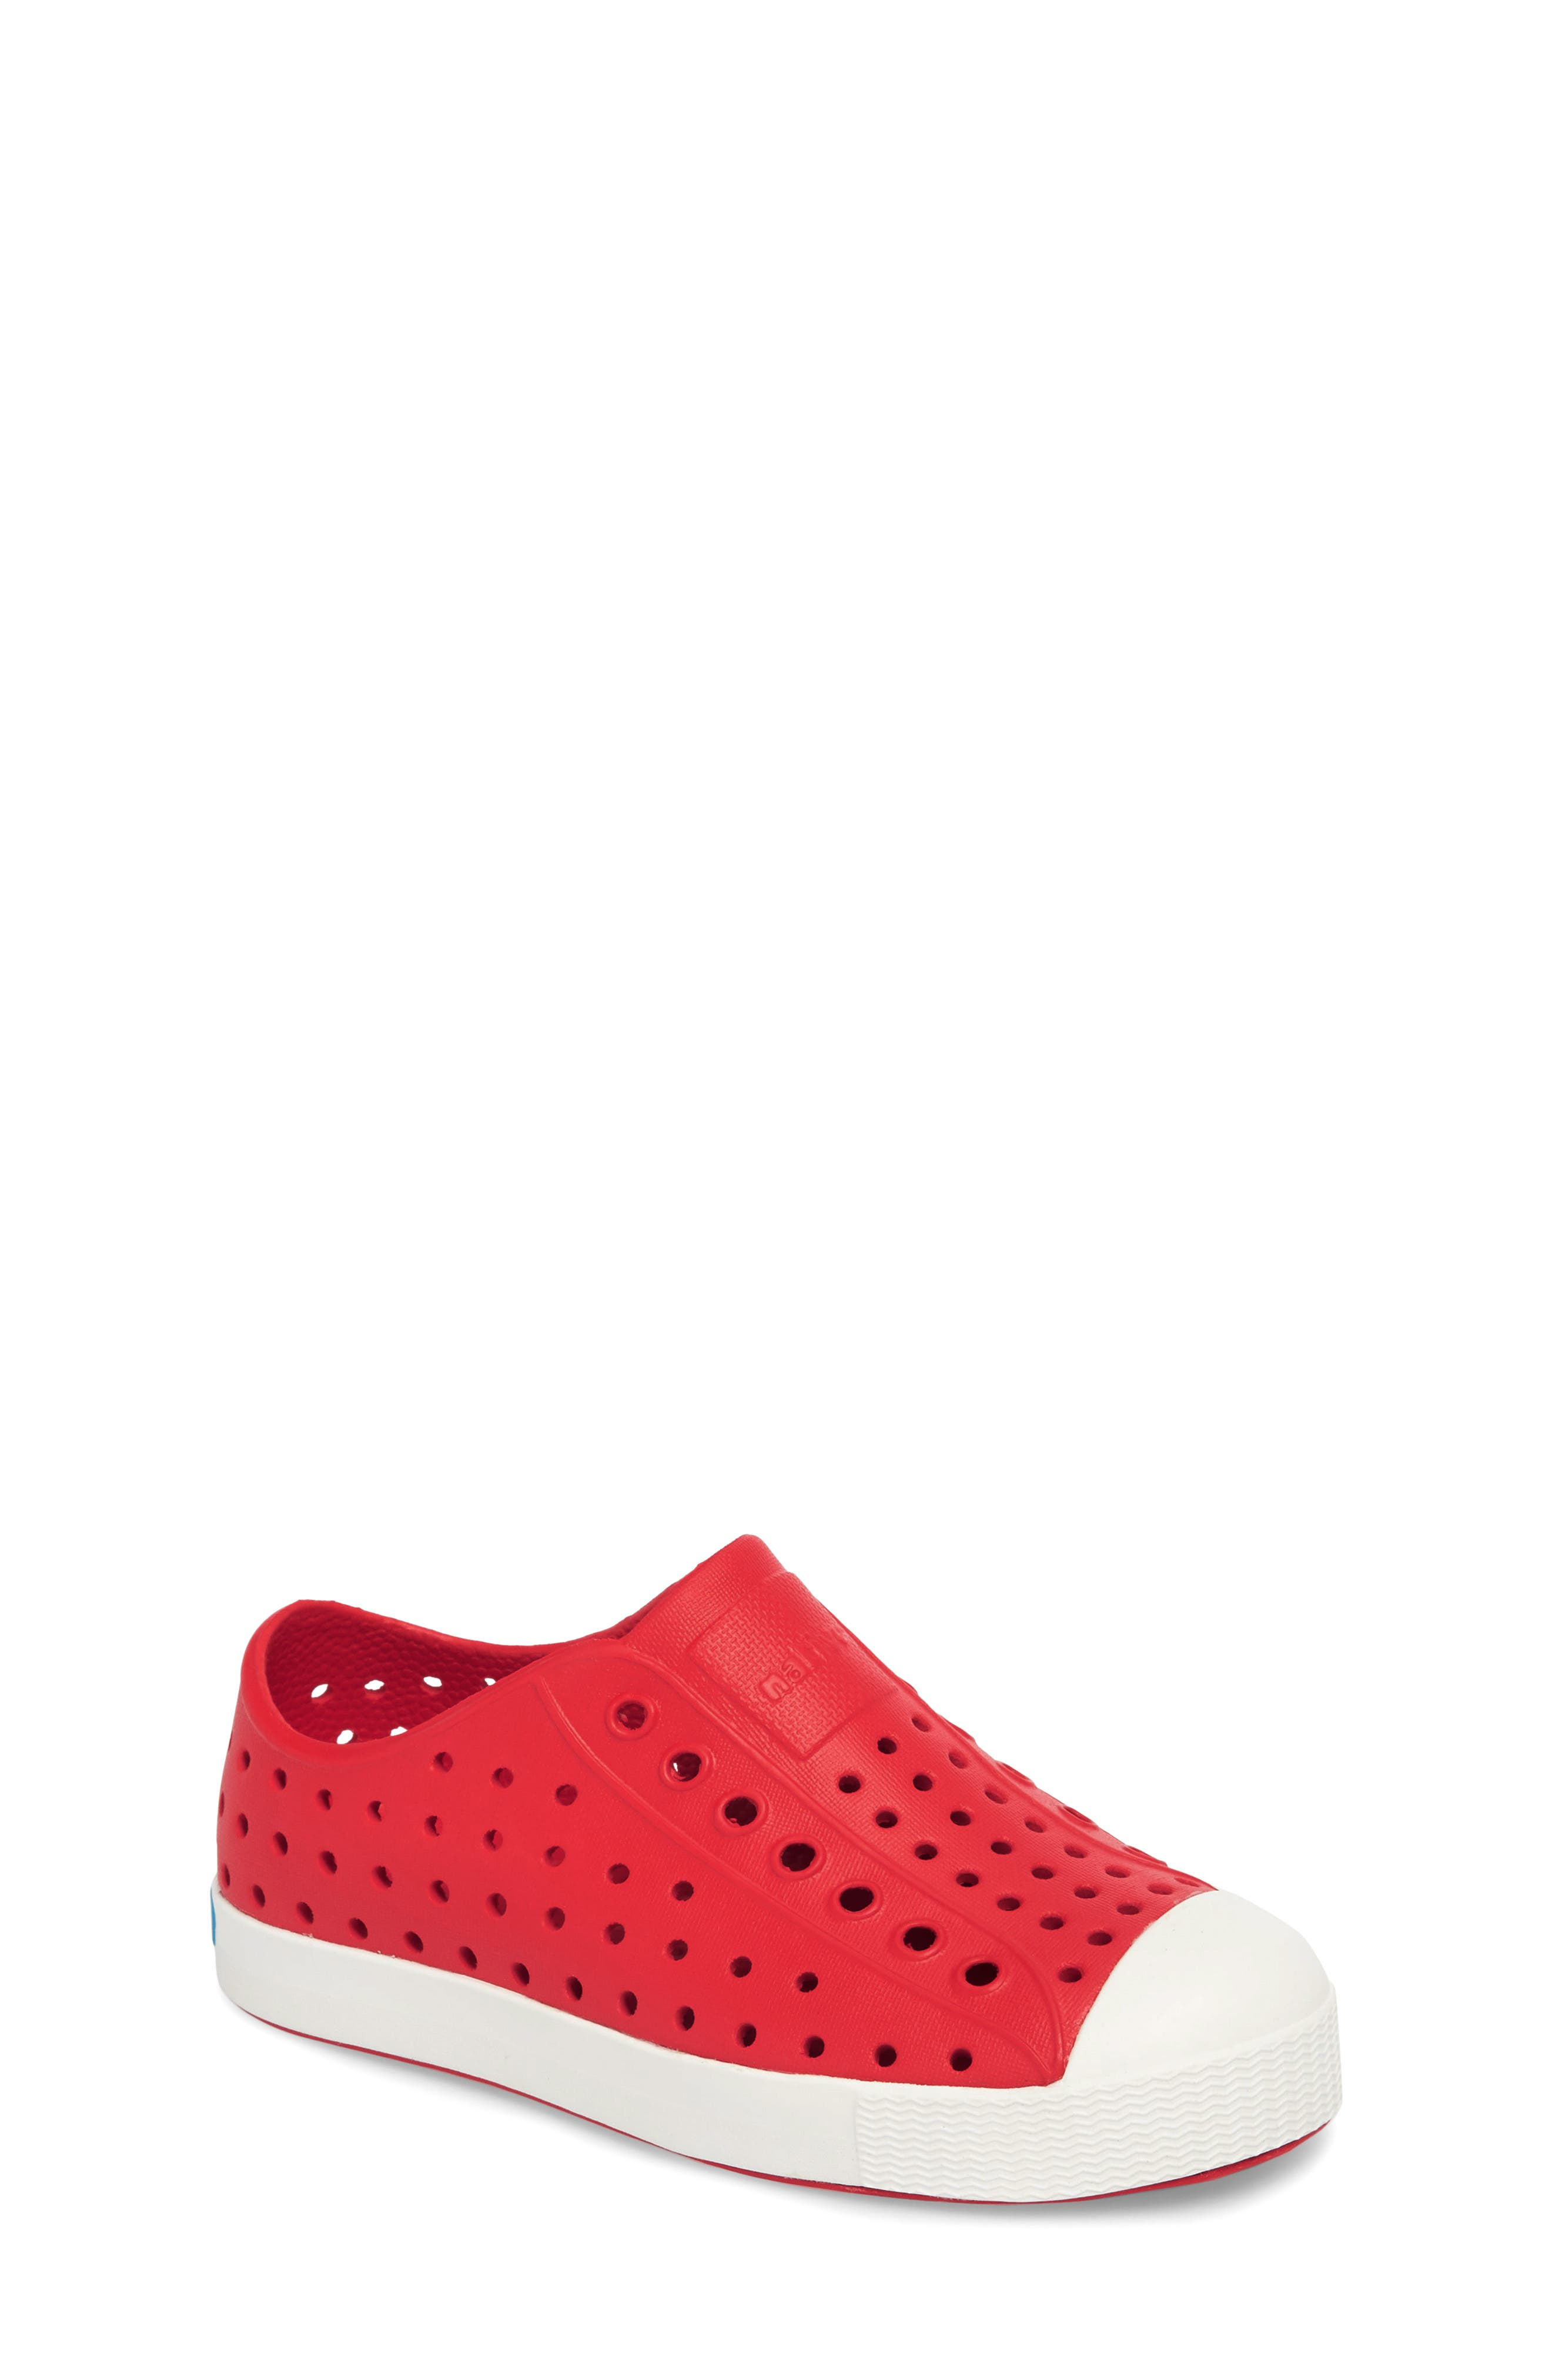 'Jefferson' Water Friendly Slip-On Sneaker,                             Main thumbnail 22, color,